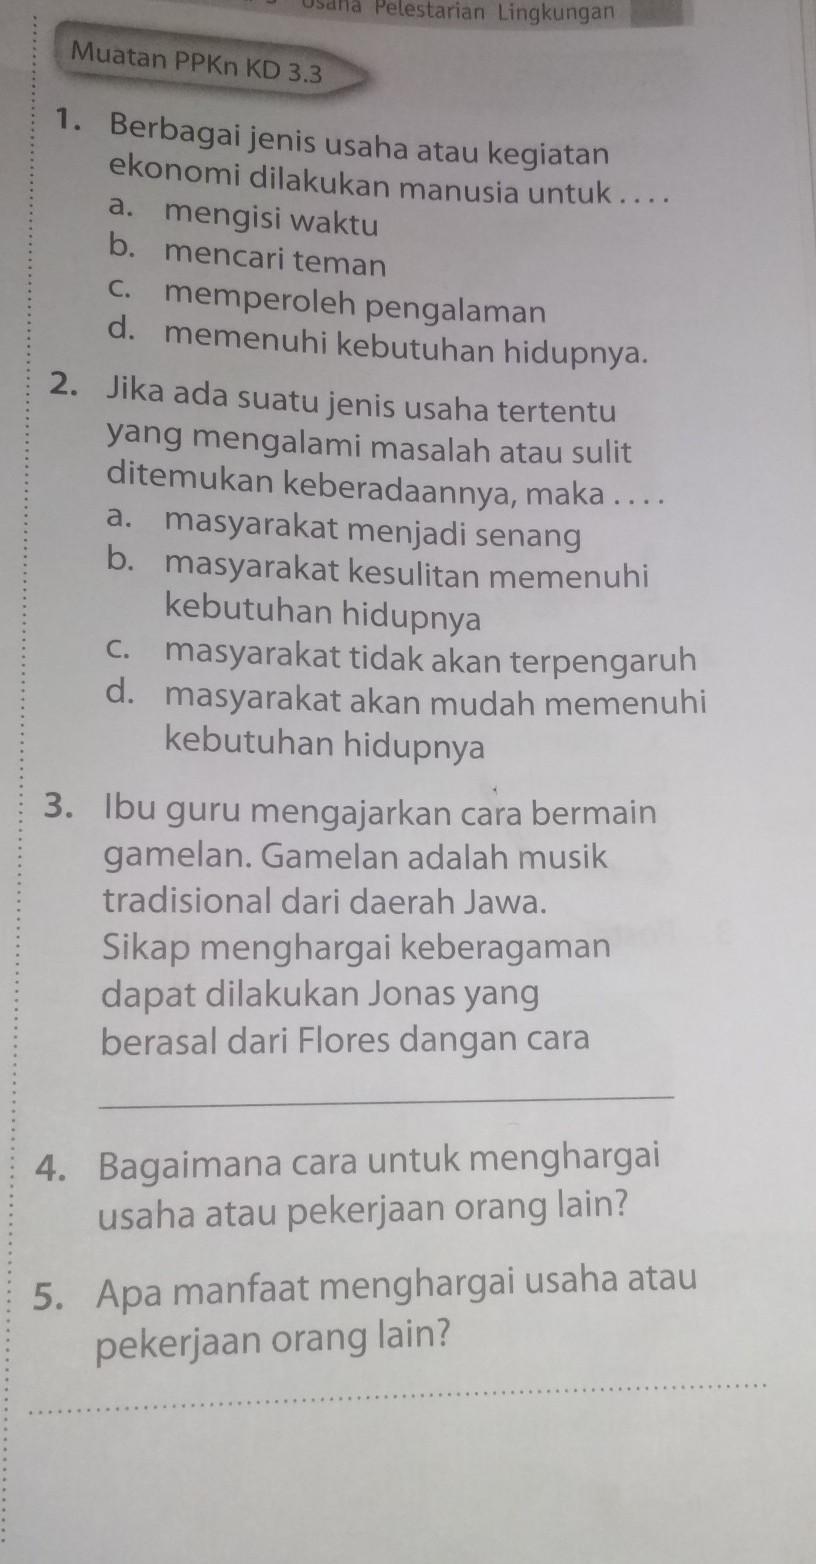 Cara Menghargai Keragaman Budaya : menghargai, keragaman, budaya, Sebutkan, Menghargai, Keragaman, Budaya, Indonesia